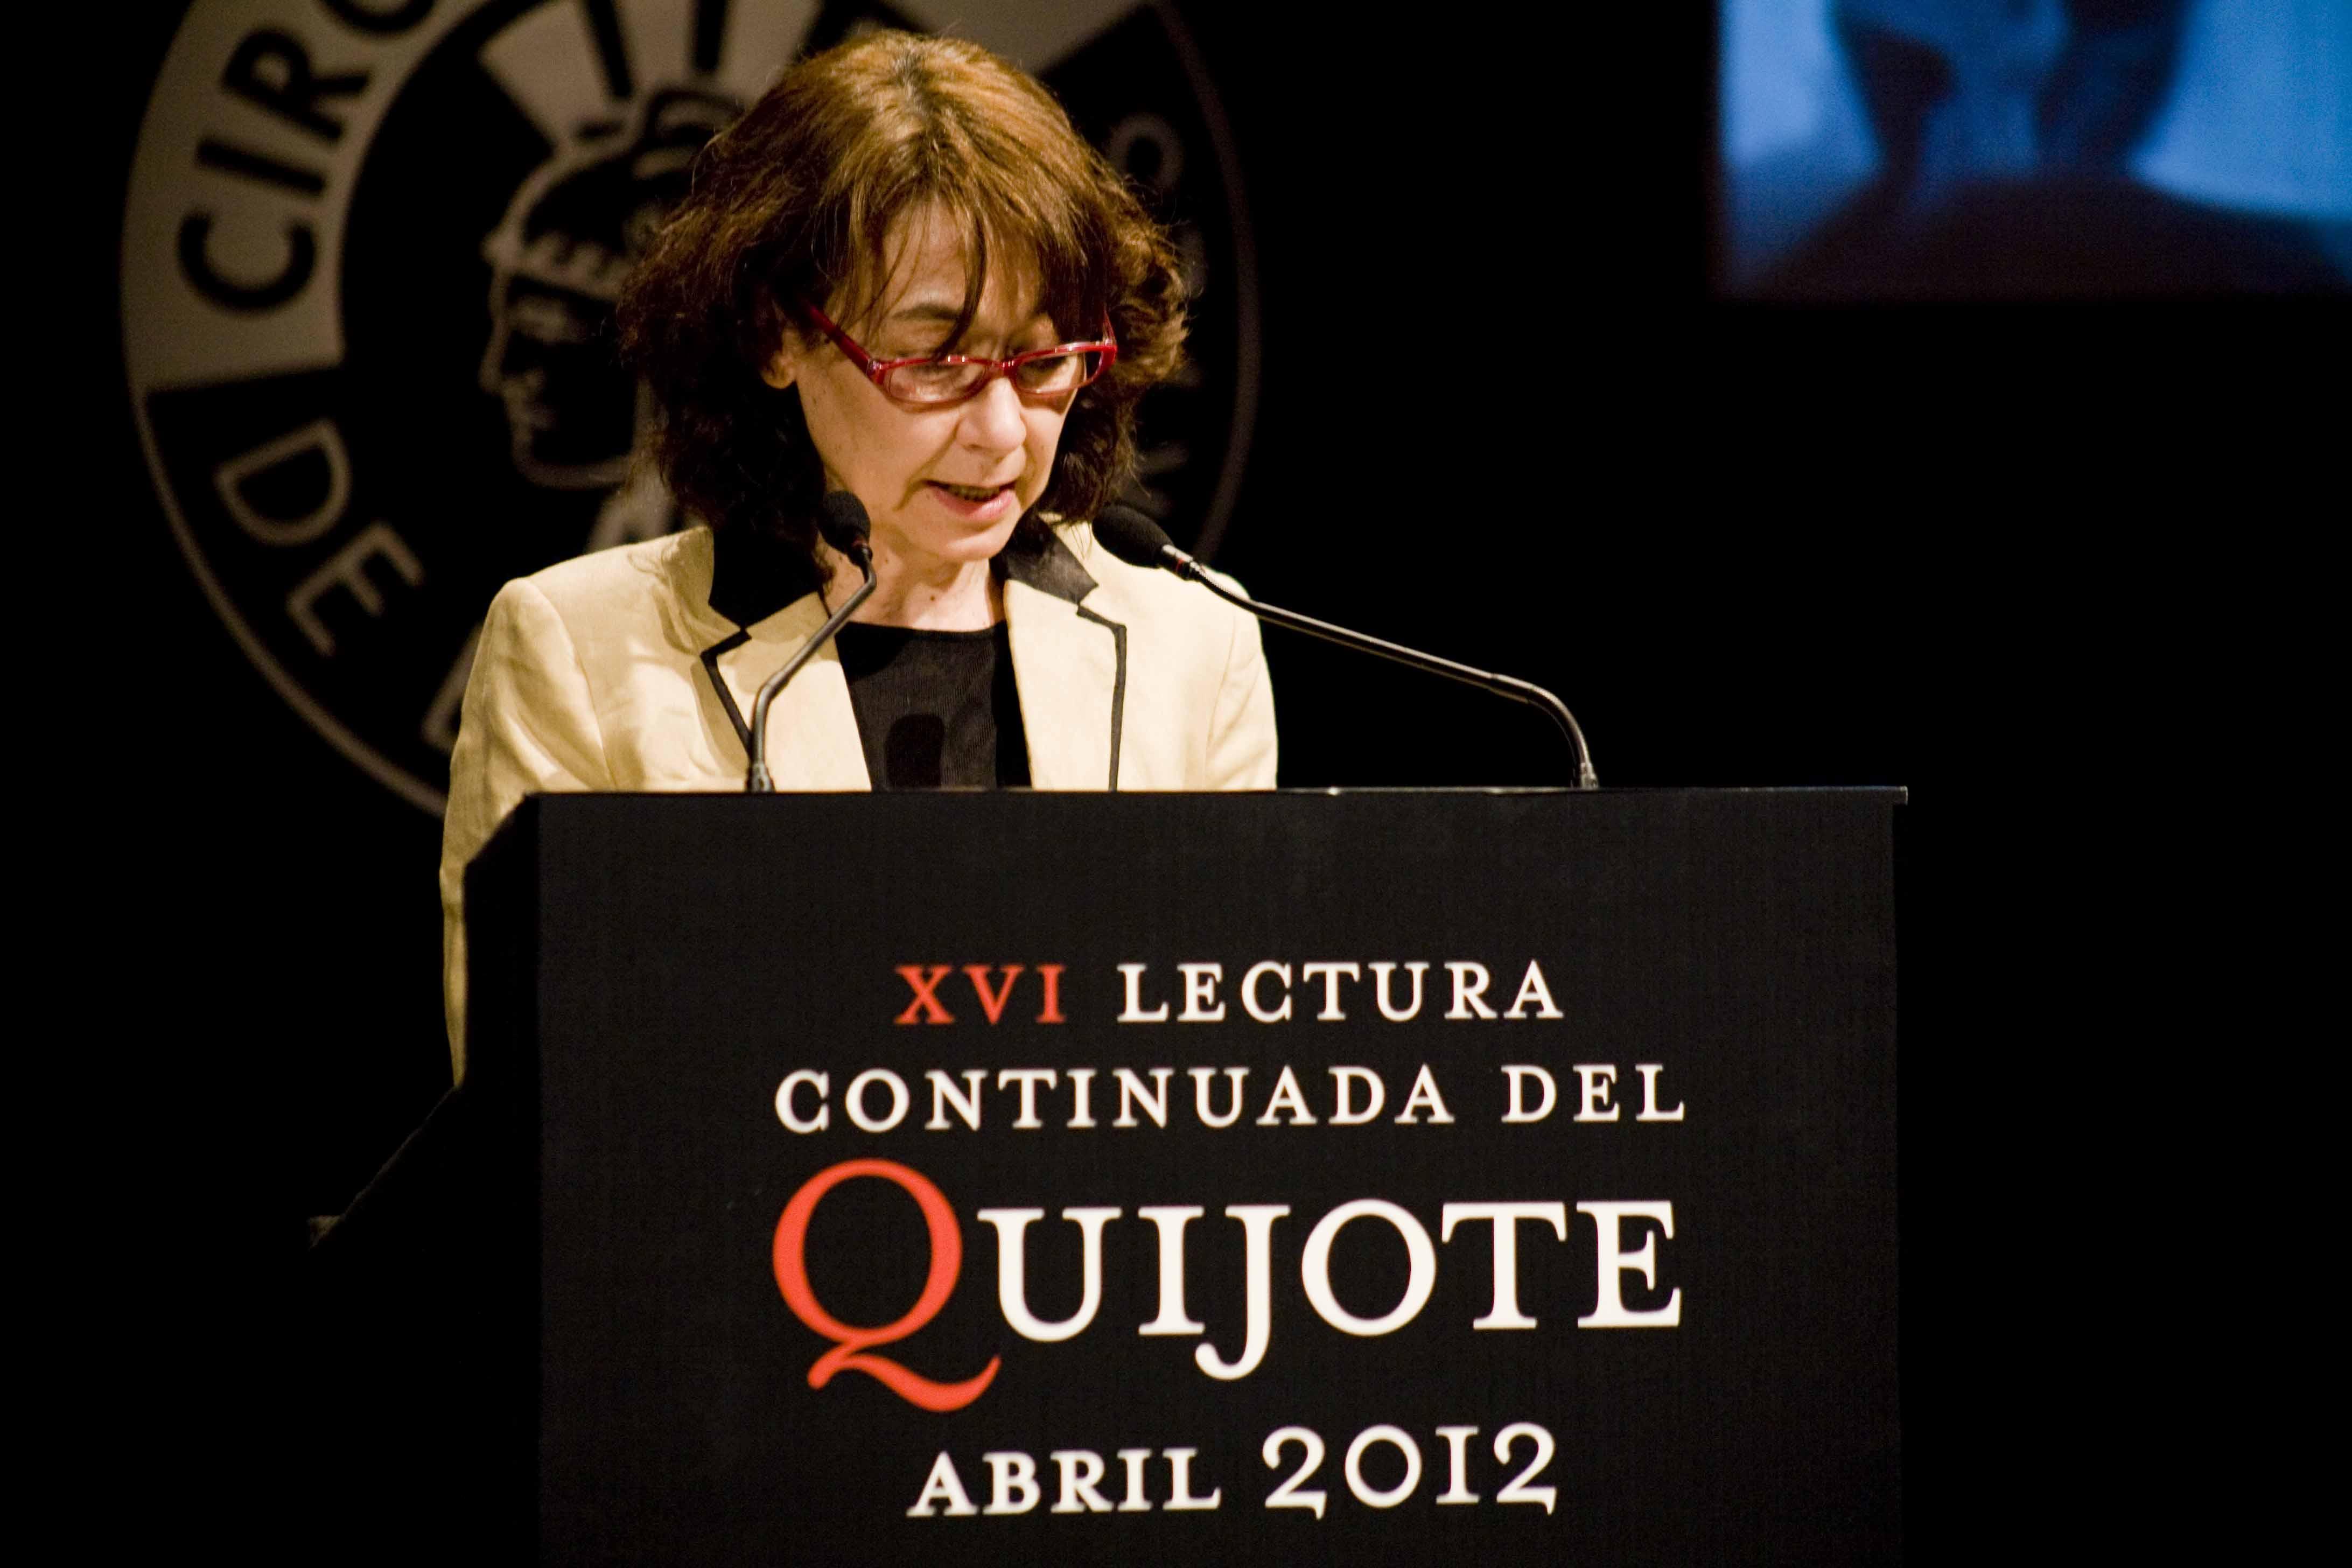 #JCLinguisticaAragon: Araceli Godino y el portal Leer.es